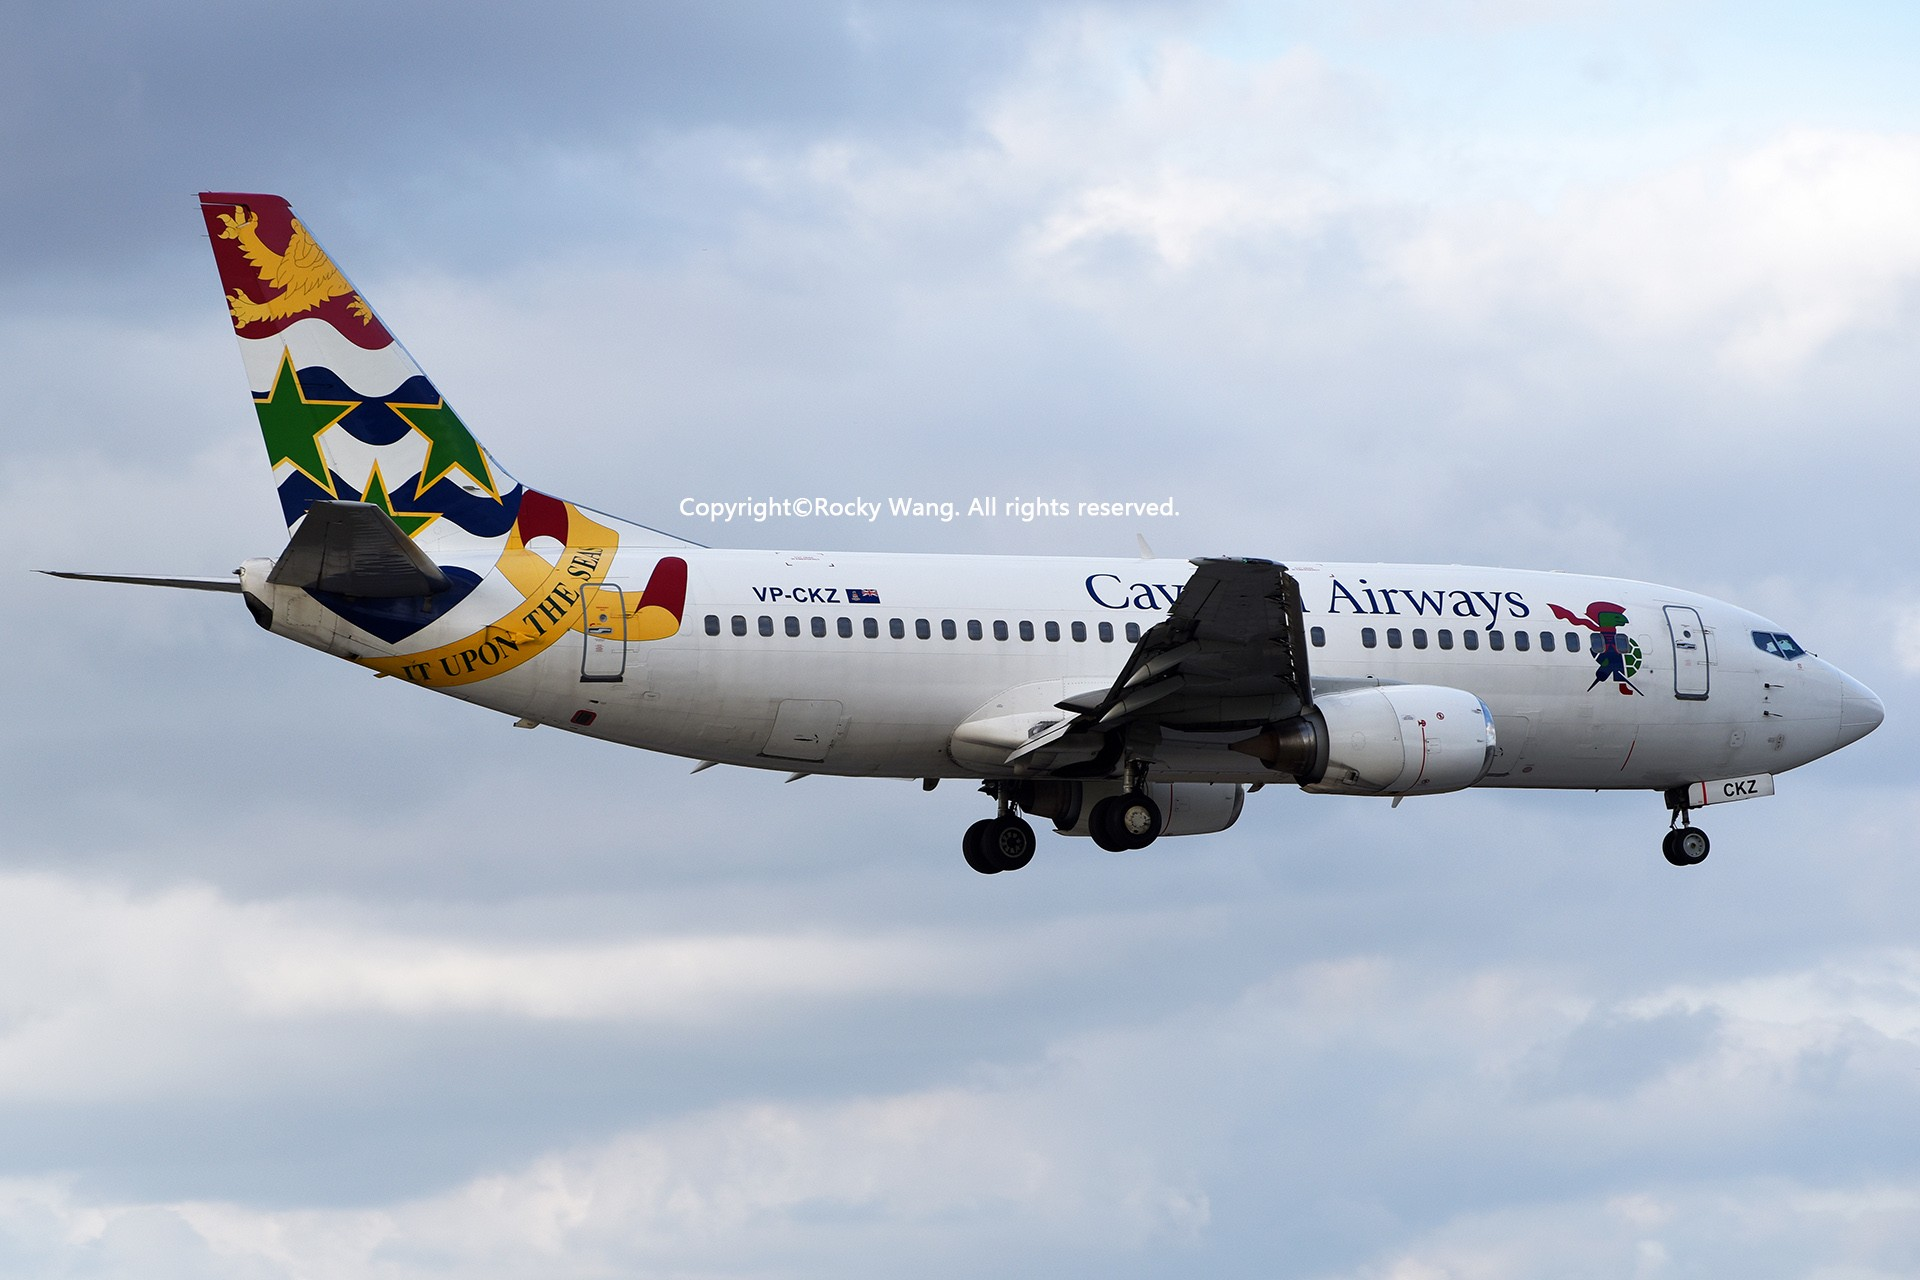 Re:[原创]KMIA 30图 BOEING 737-36E VP-CKZ Miami Int'l Airport